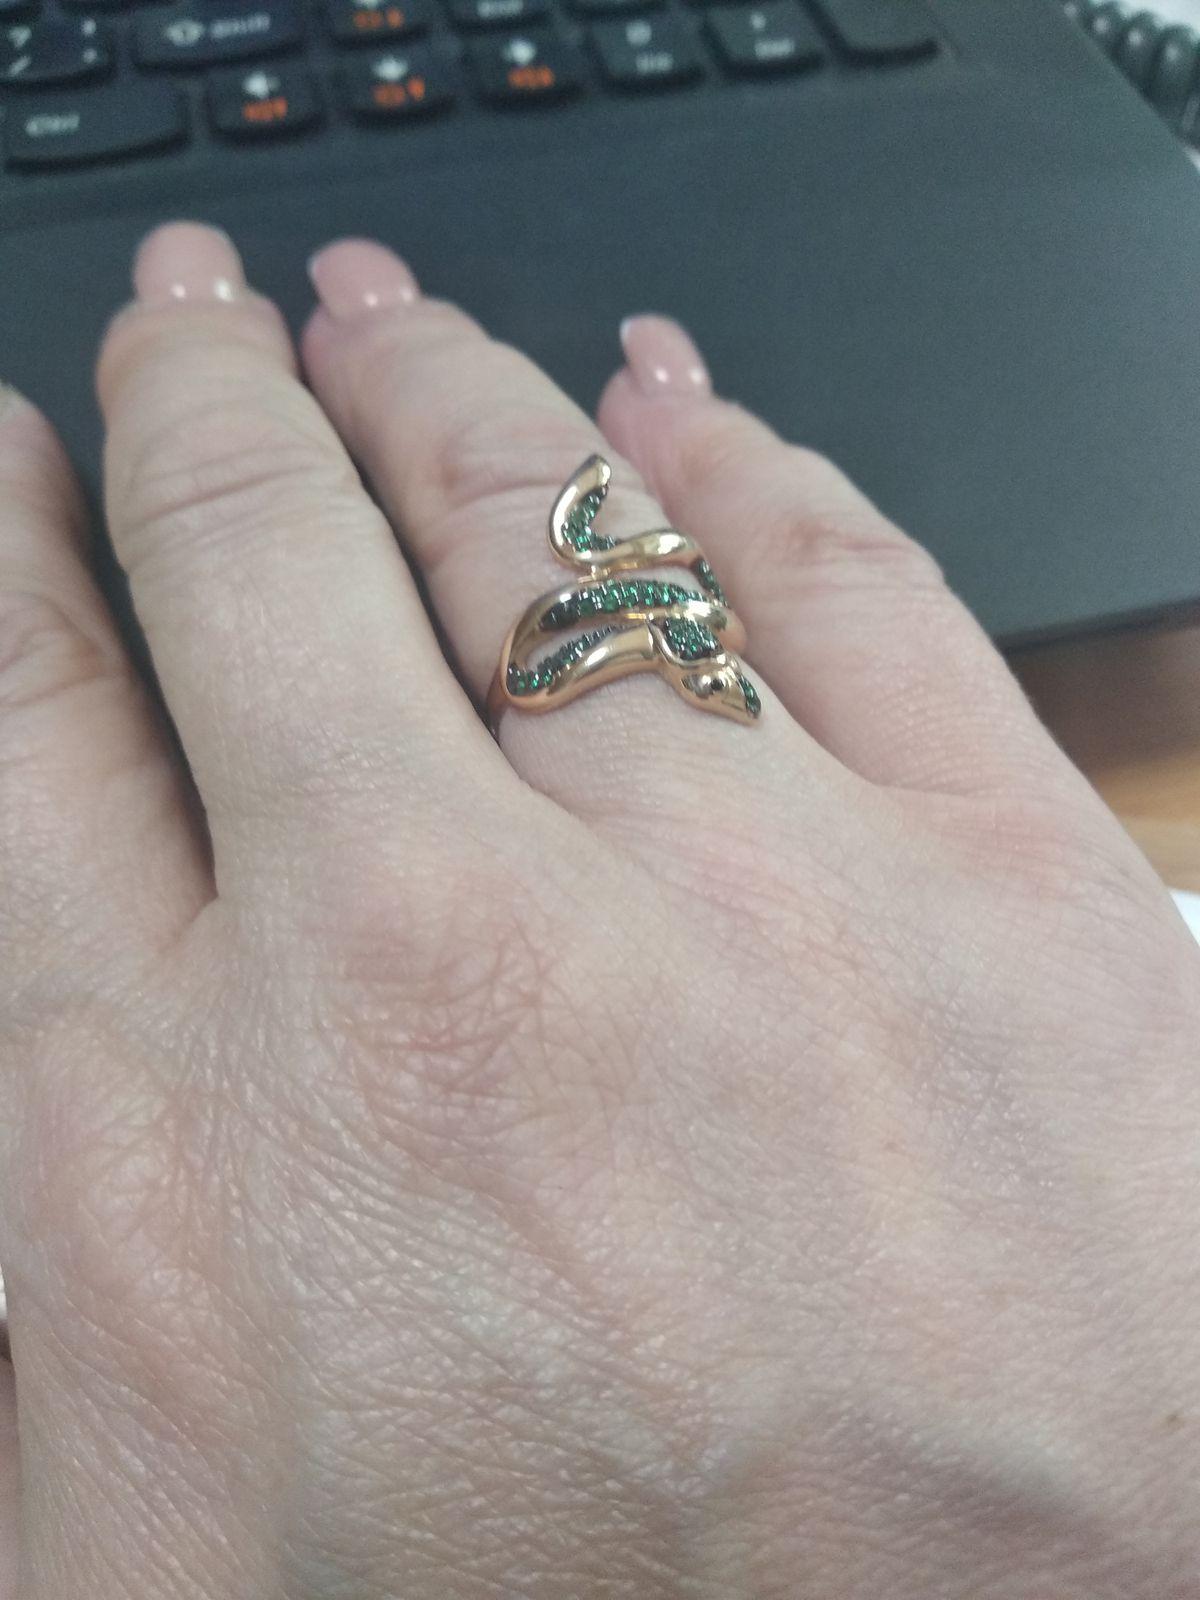 Змея, ласково обвивающая палец!